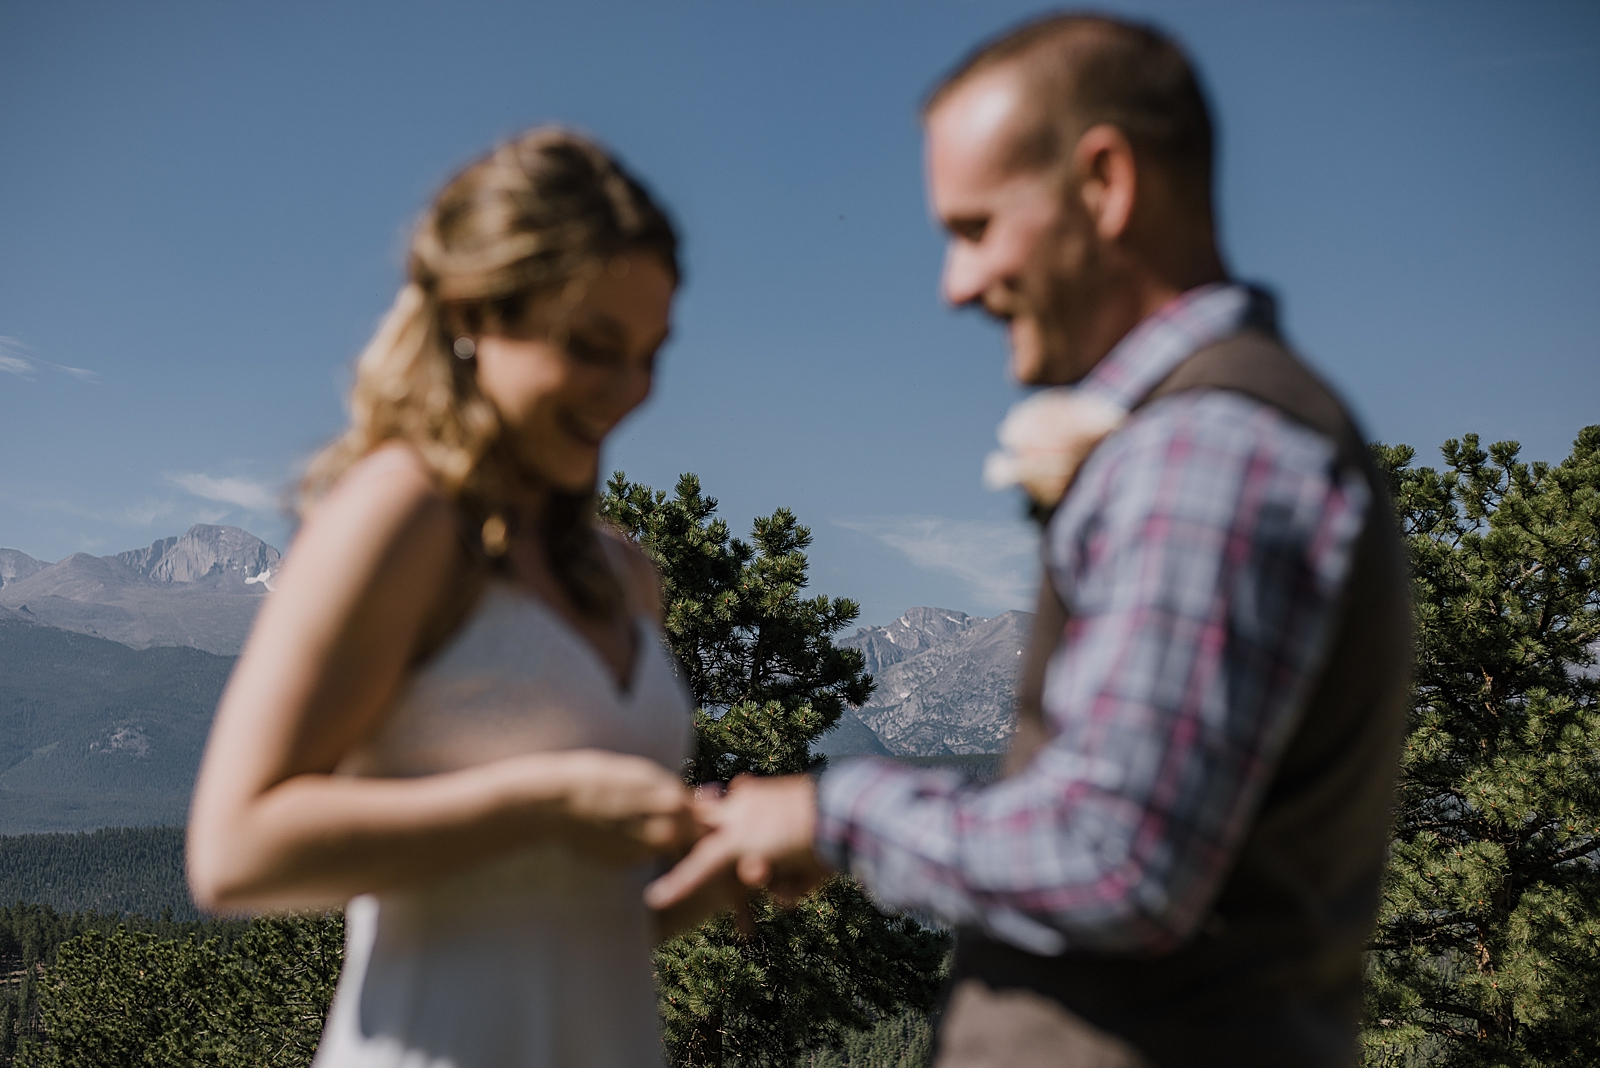 ring exchange, RMNP elopement ceremony, rocky mountain national park elopement, 3M curves elopement, self solemnizing, self solemnization, long's peak, hiking elopement, estes park elopement